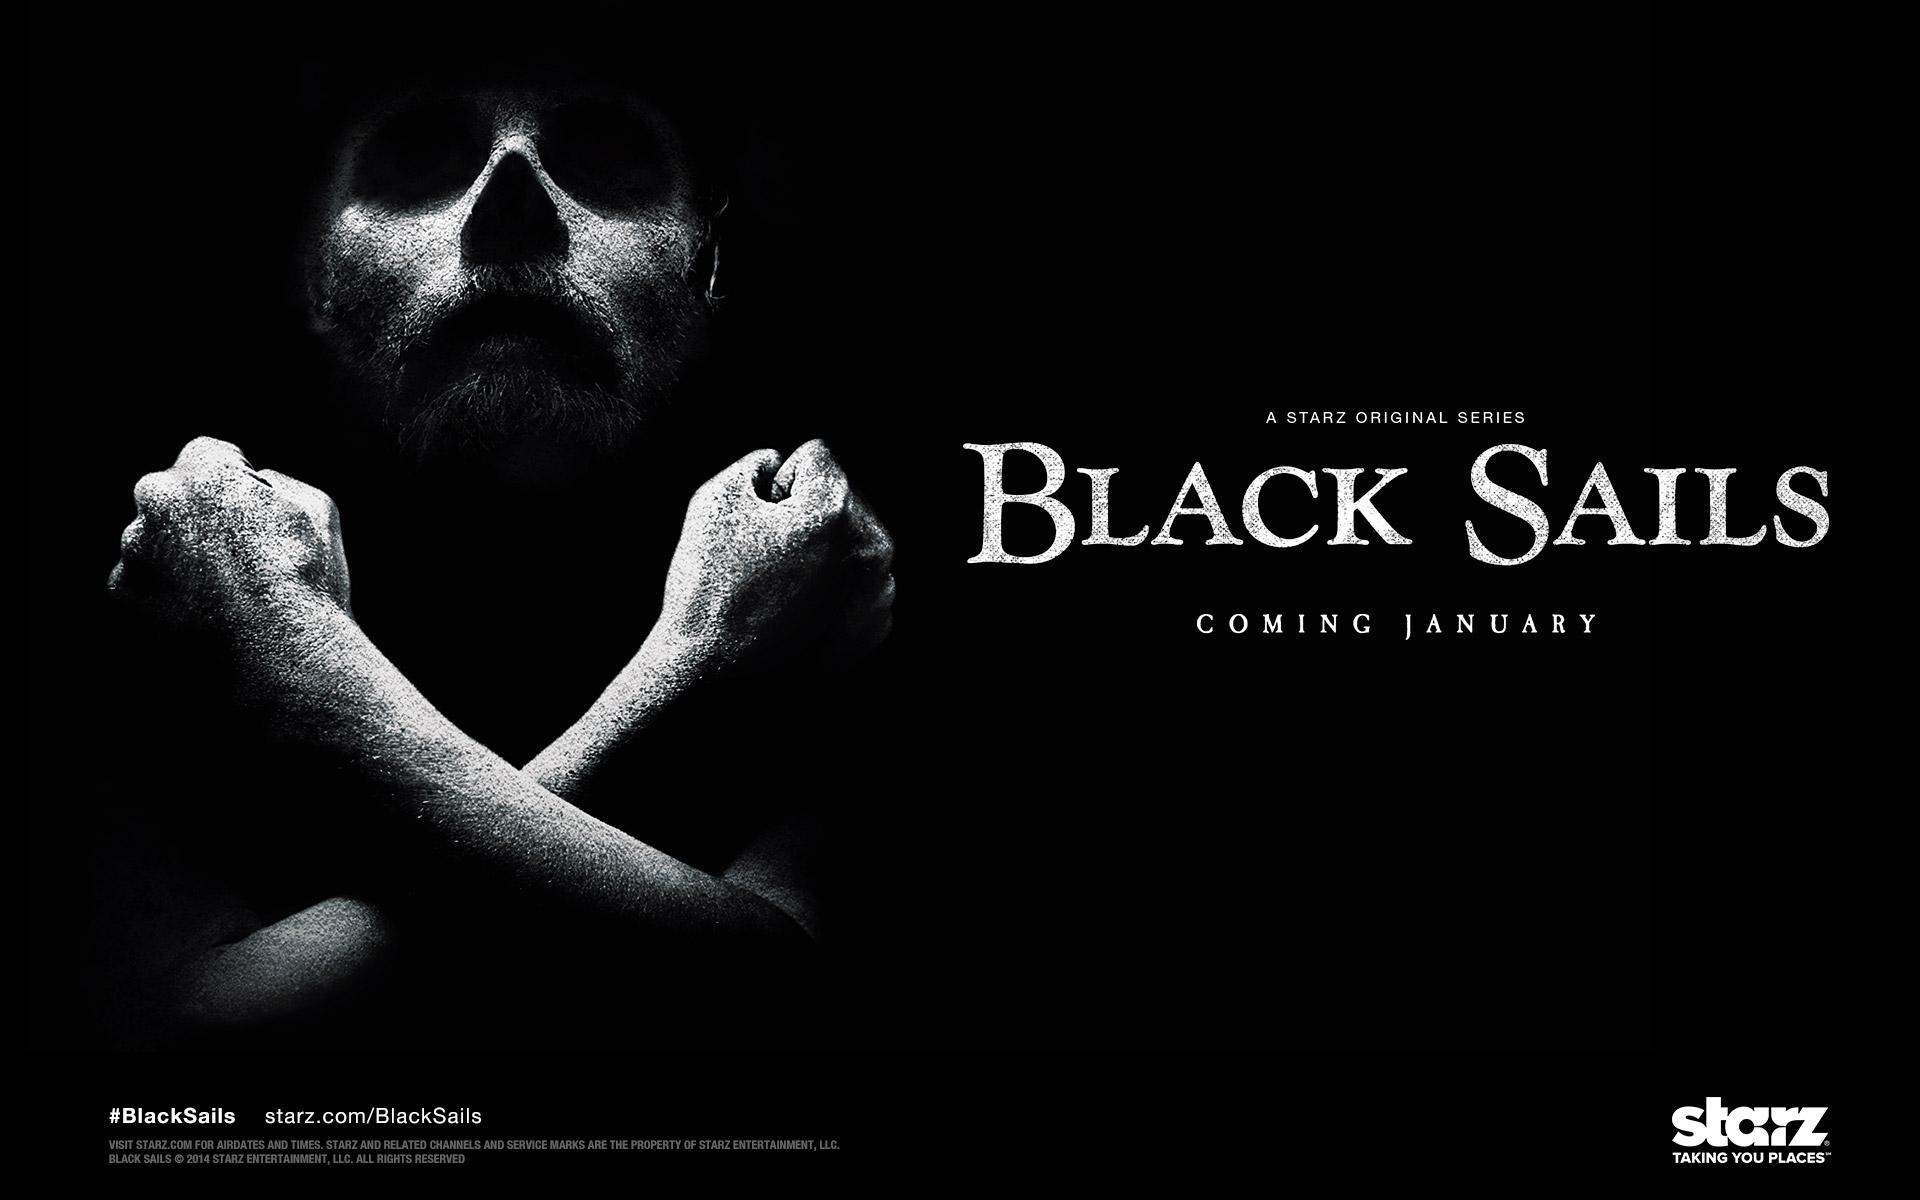 Black-Sails-A-Starz-Original-Series-image-black-sails-a-starz-original-series-36129797-1920-1200